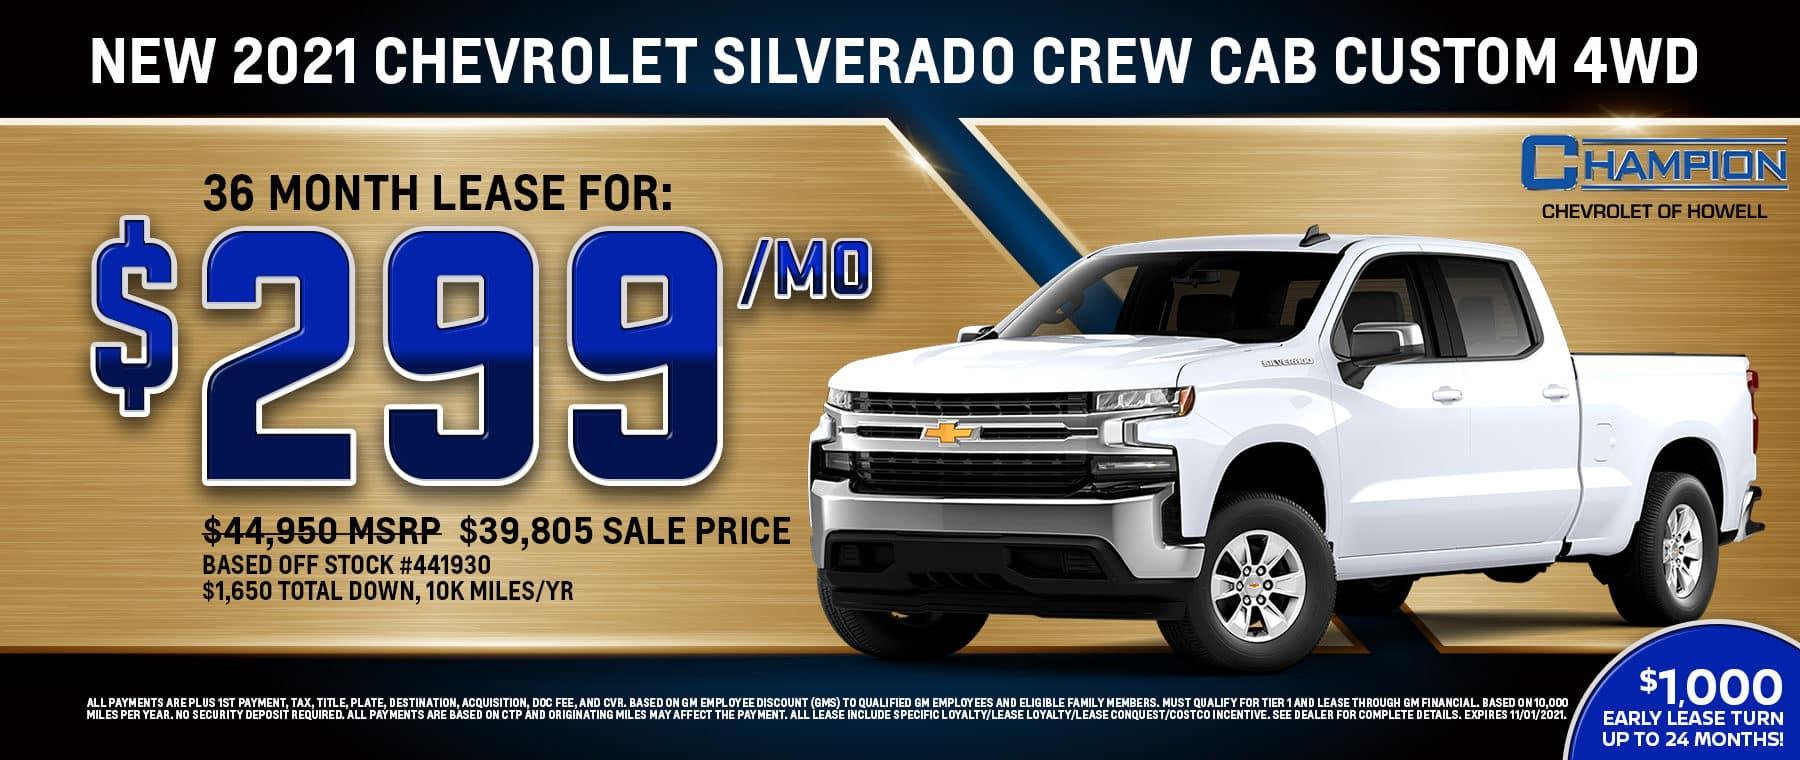 10_21_Champion_Howell_Chevy_1800x760_2021_Silverado_CC_4WD_web_banner